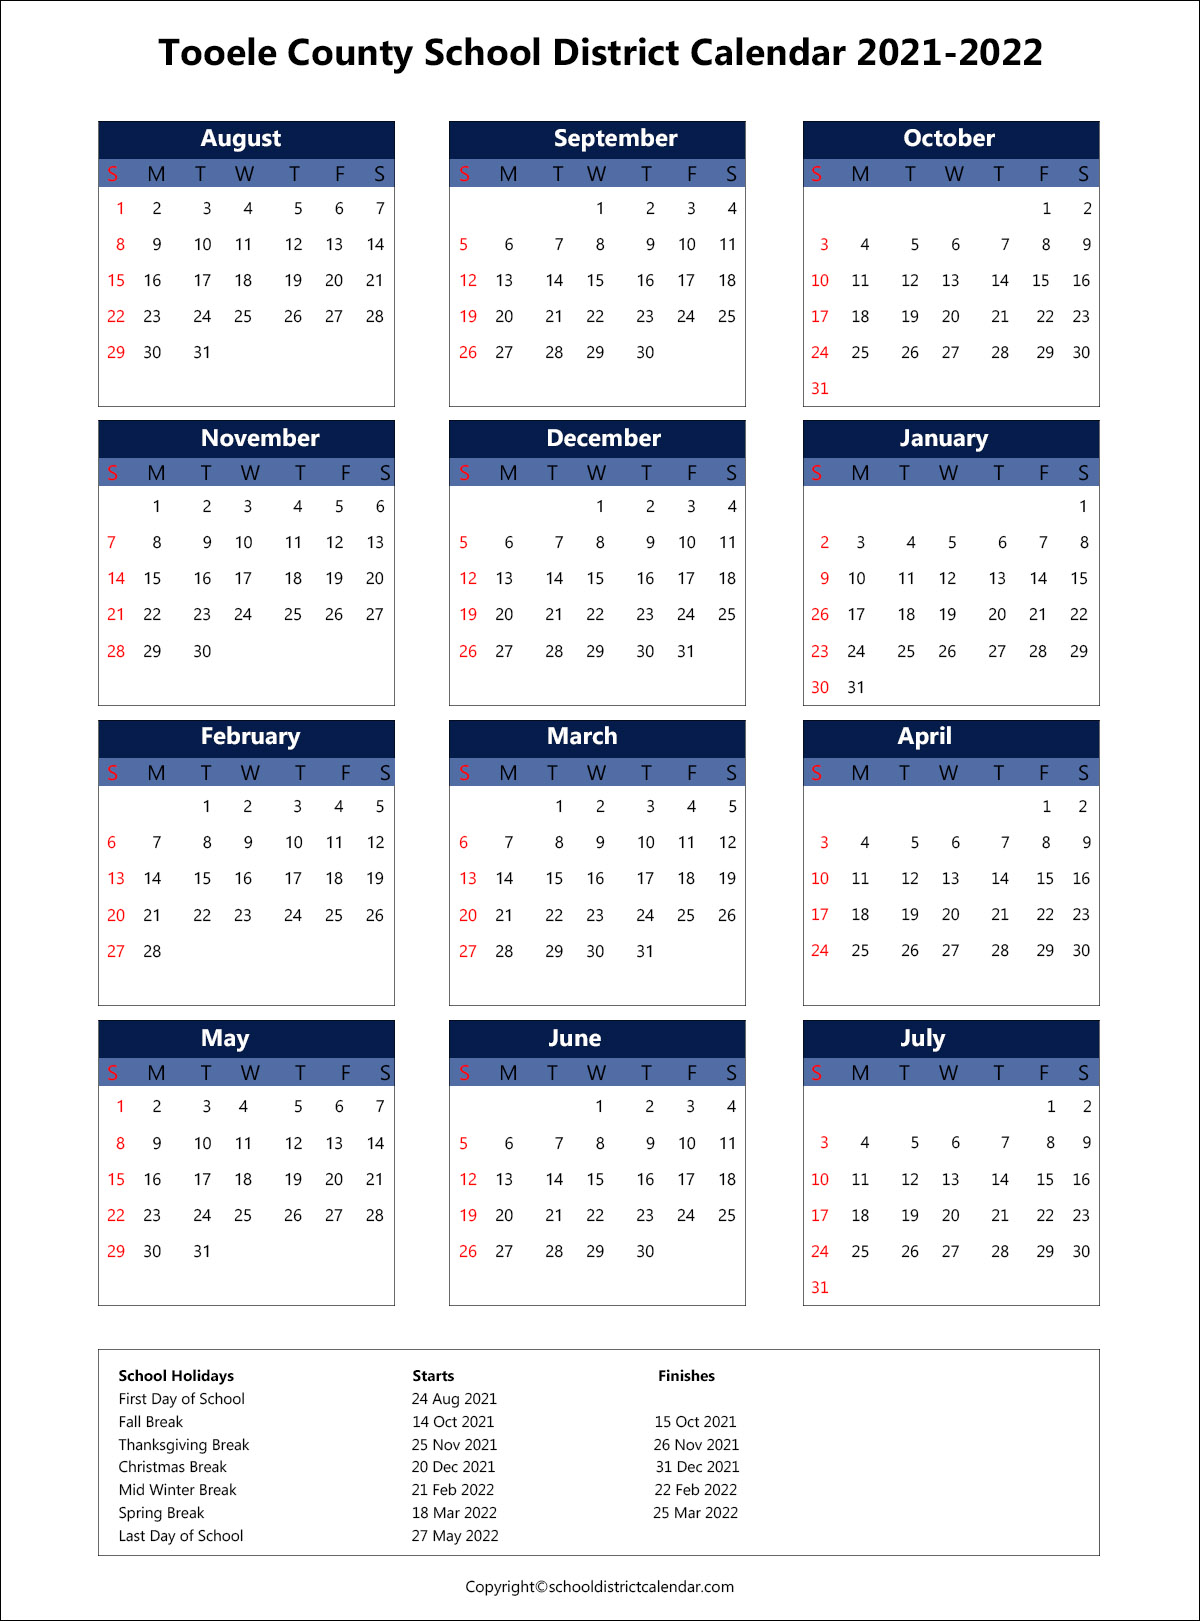 Tooele County School District Calendar 2021